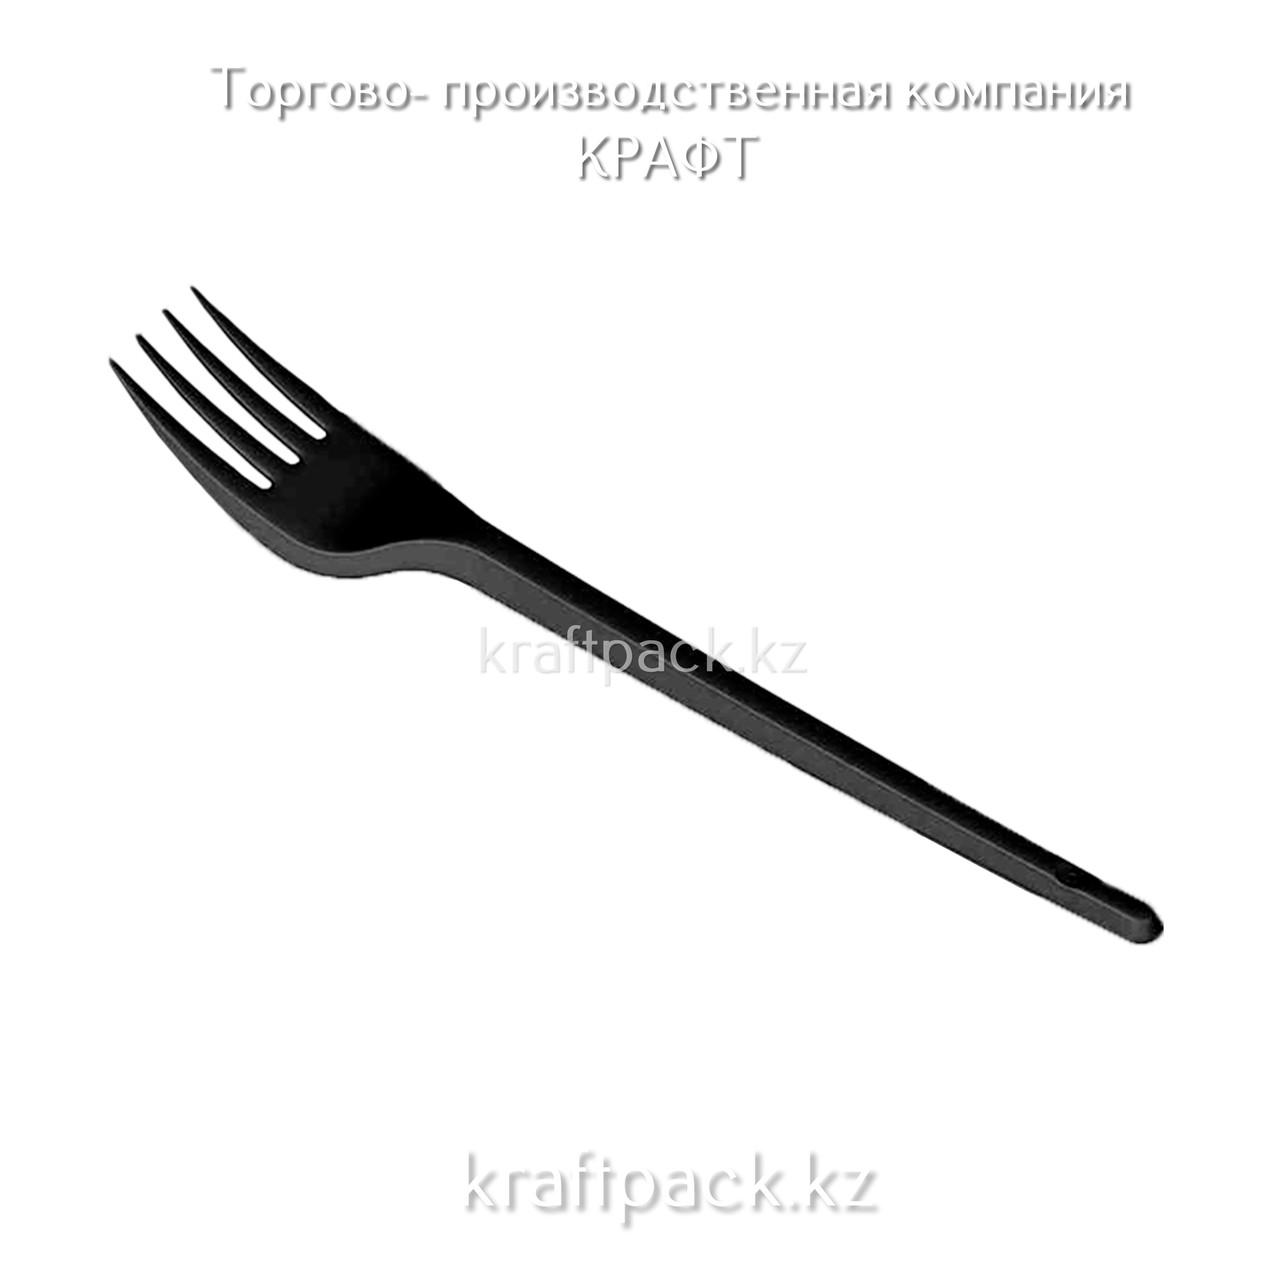 ВИЛКА пластиковая, ЧЕРНАЯ 165мм Премиум ОРЕЛ (100/2200)